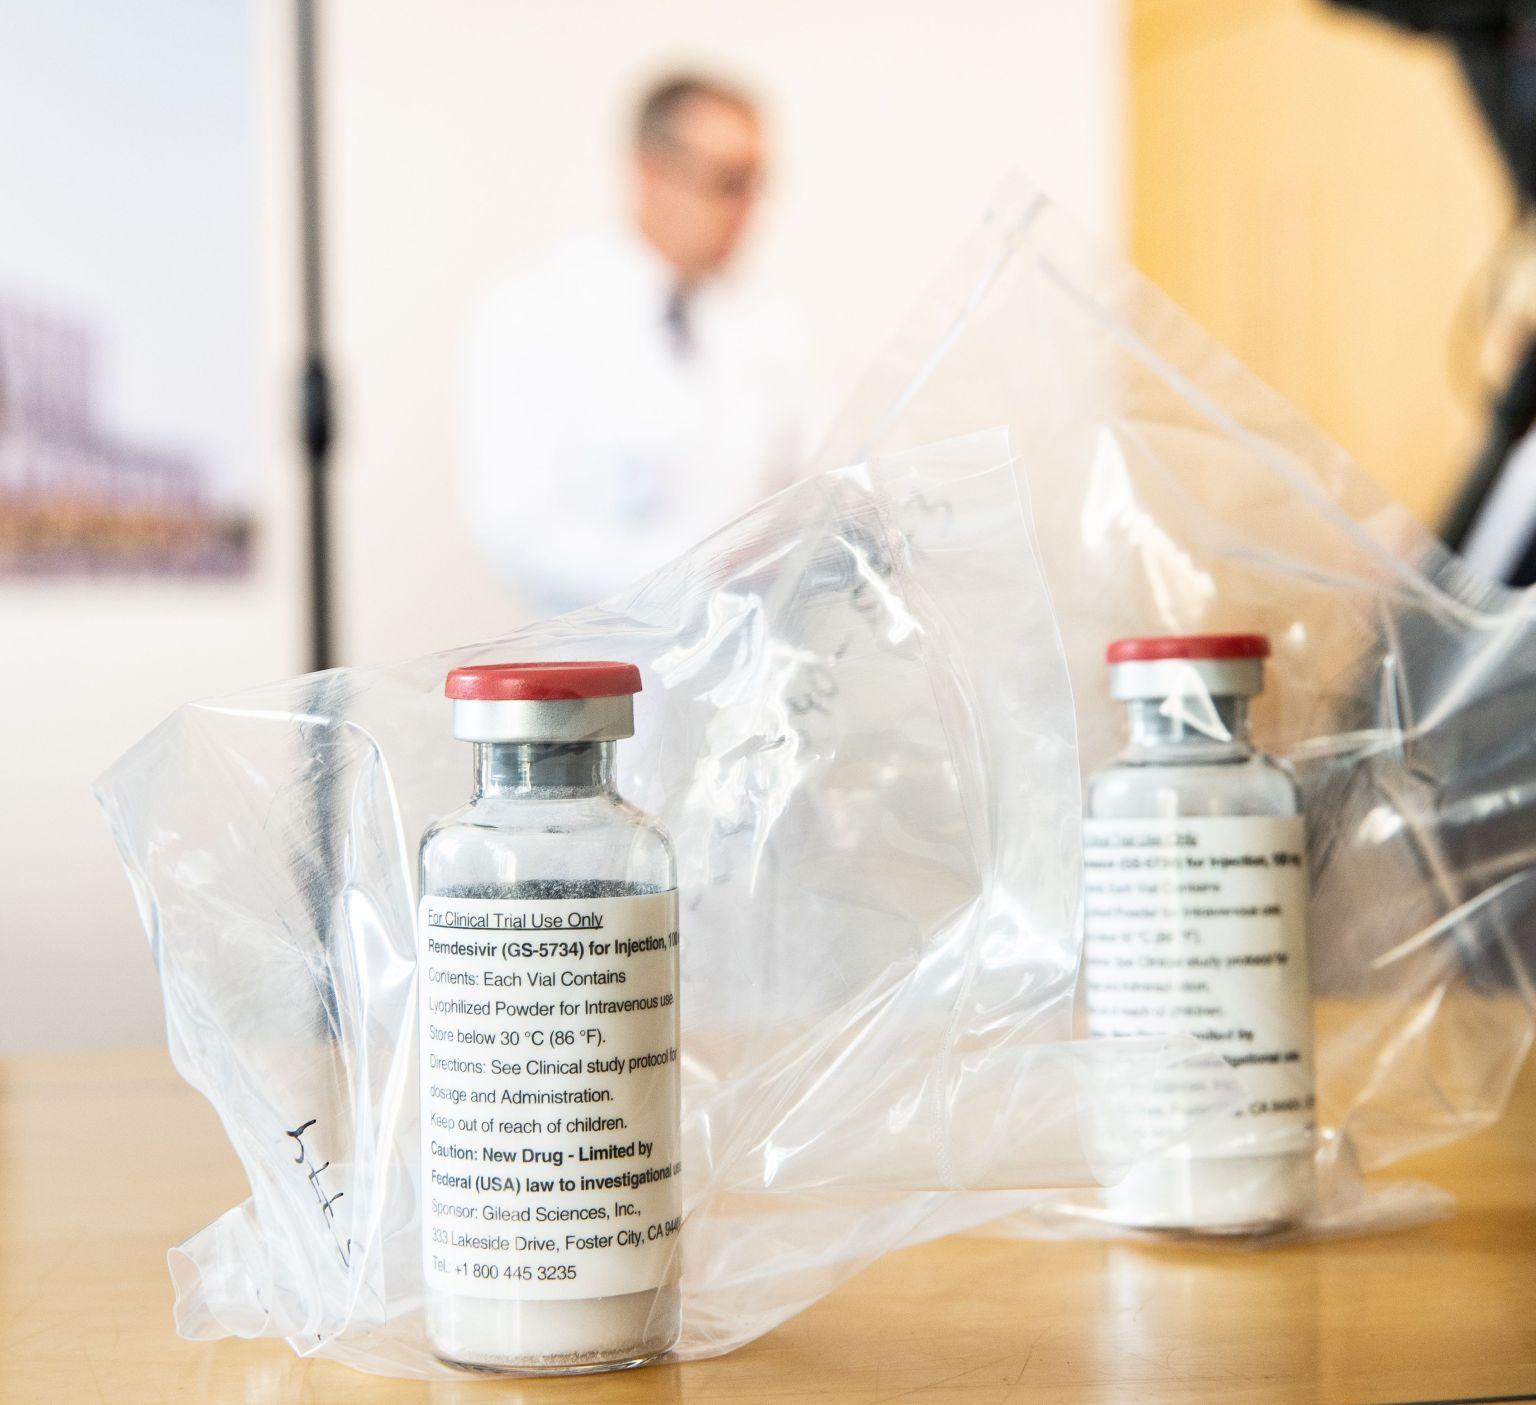 FDA approves Remdesivir to treat Covid-19